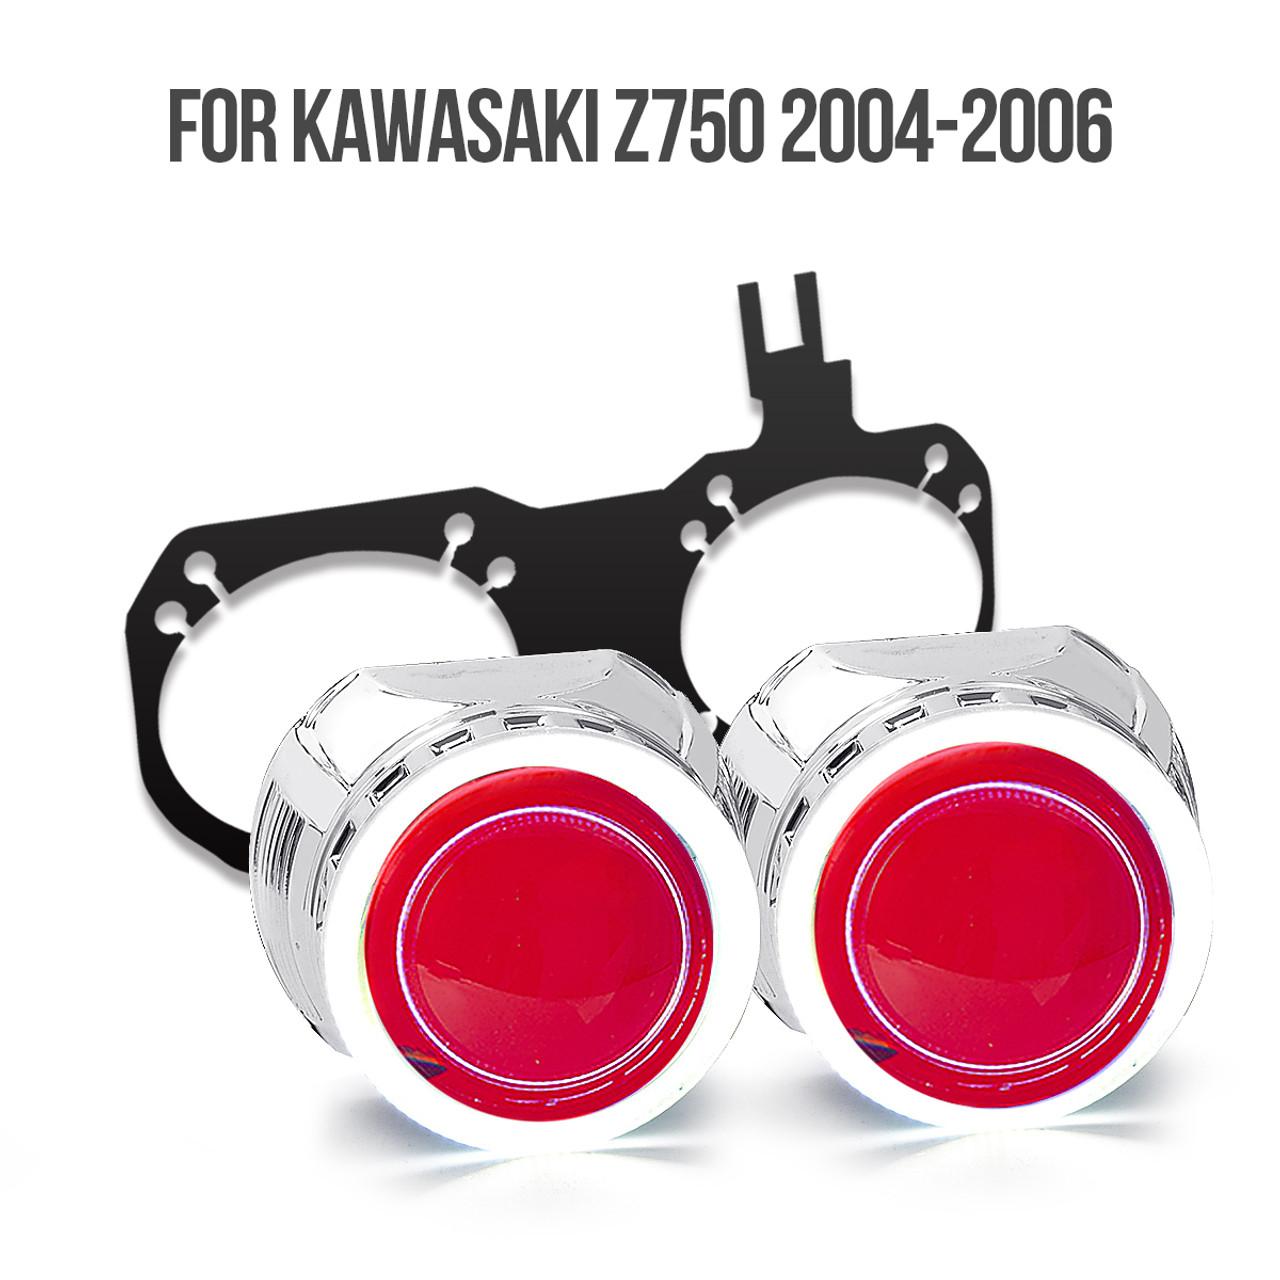 hight resolution of 2004 kawasaki z750 hid projector kit